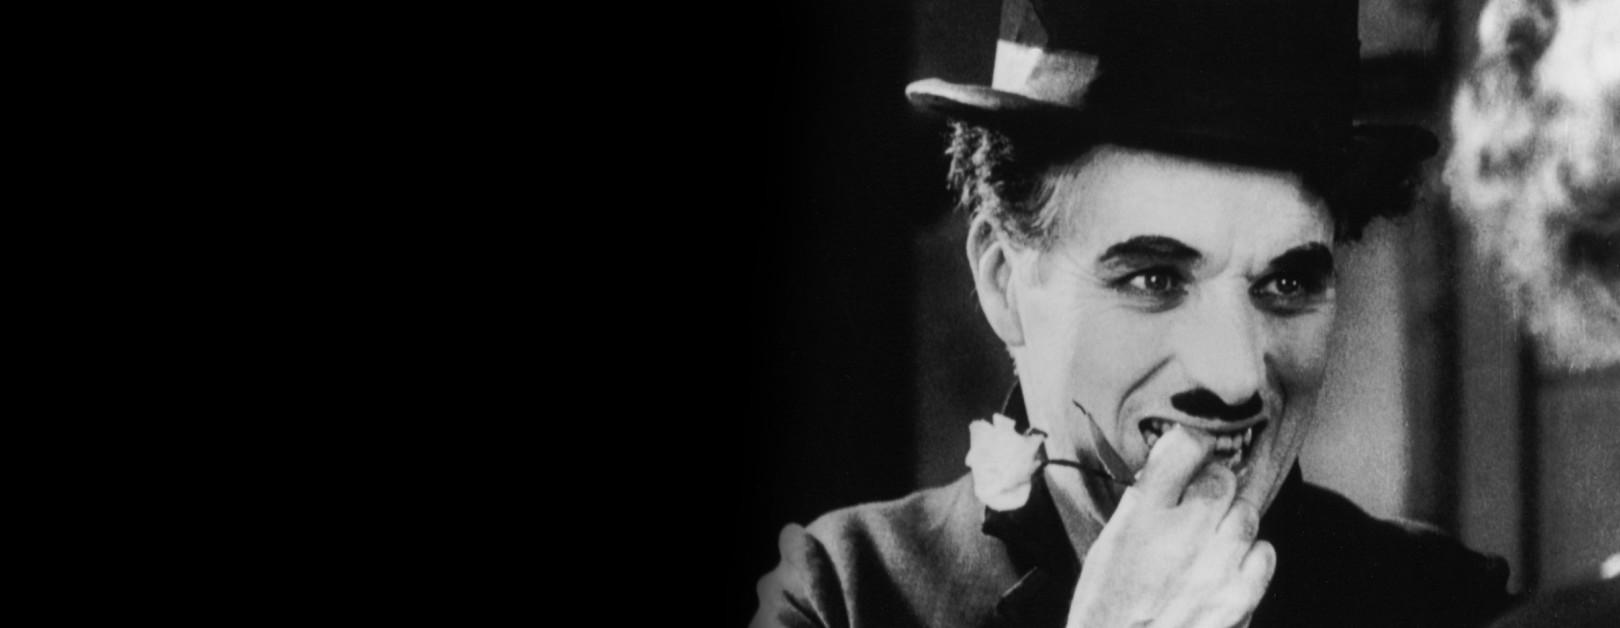 Charlie Chaplin's City Lights in Shanghai